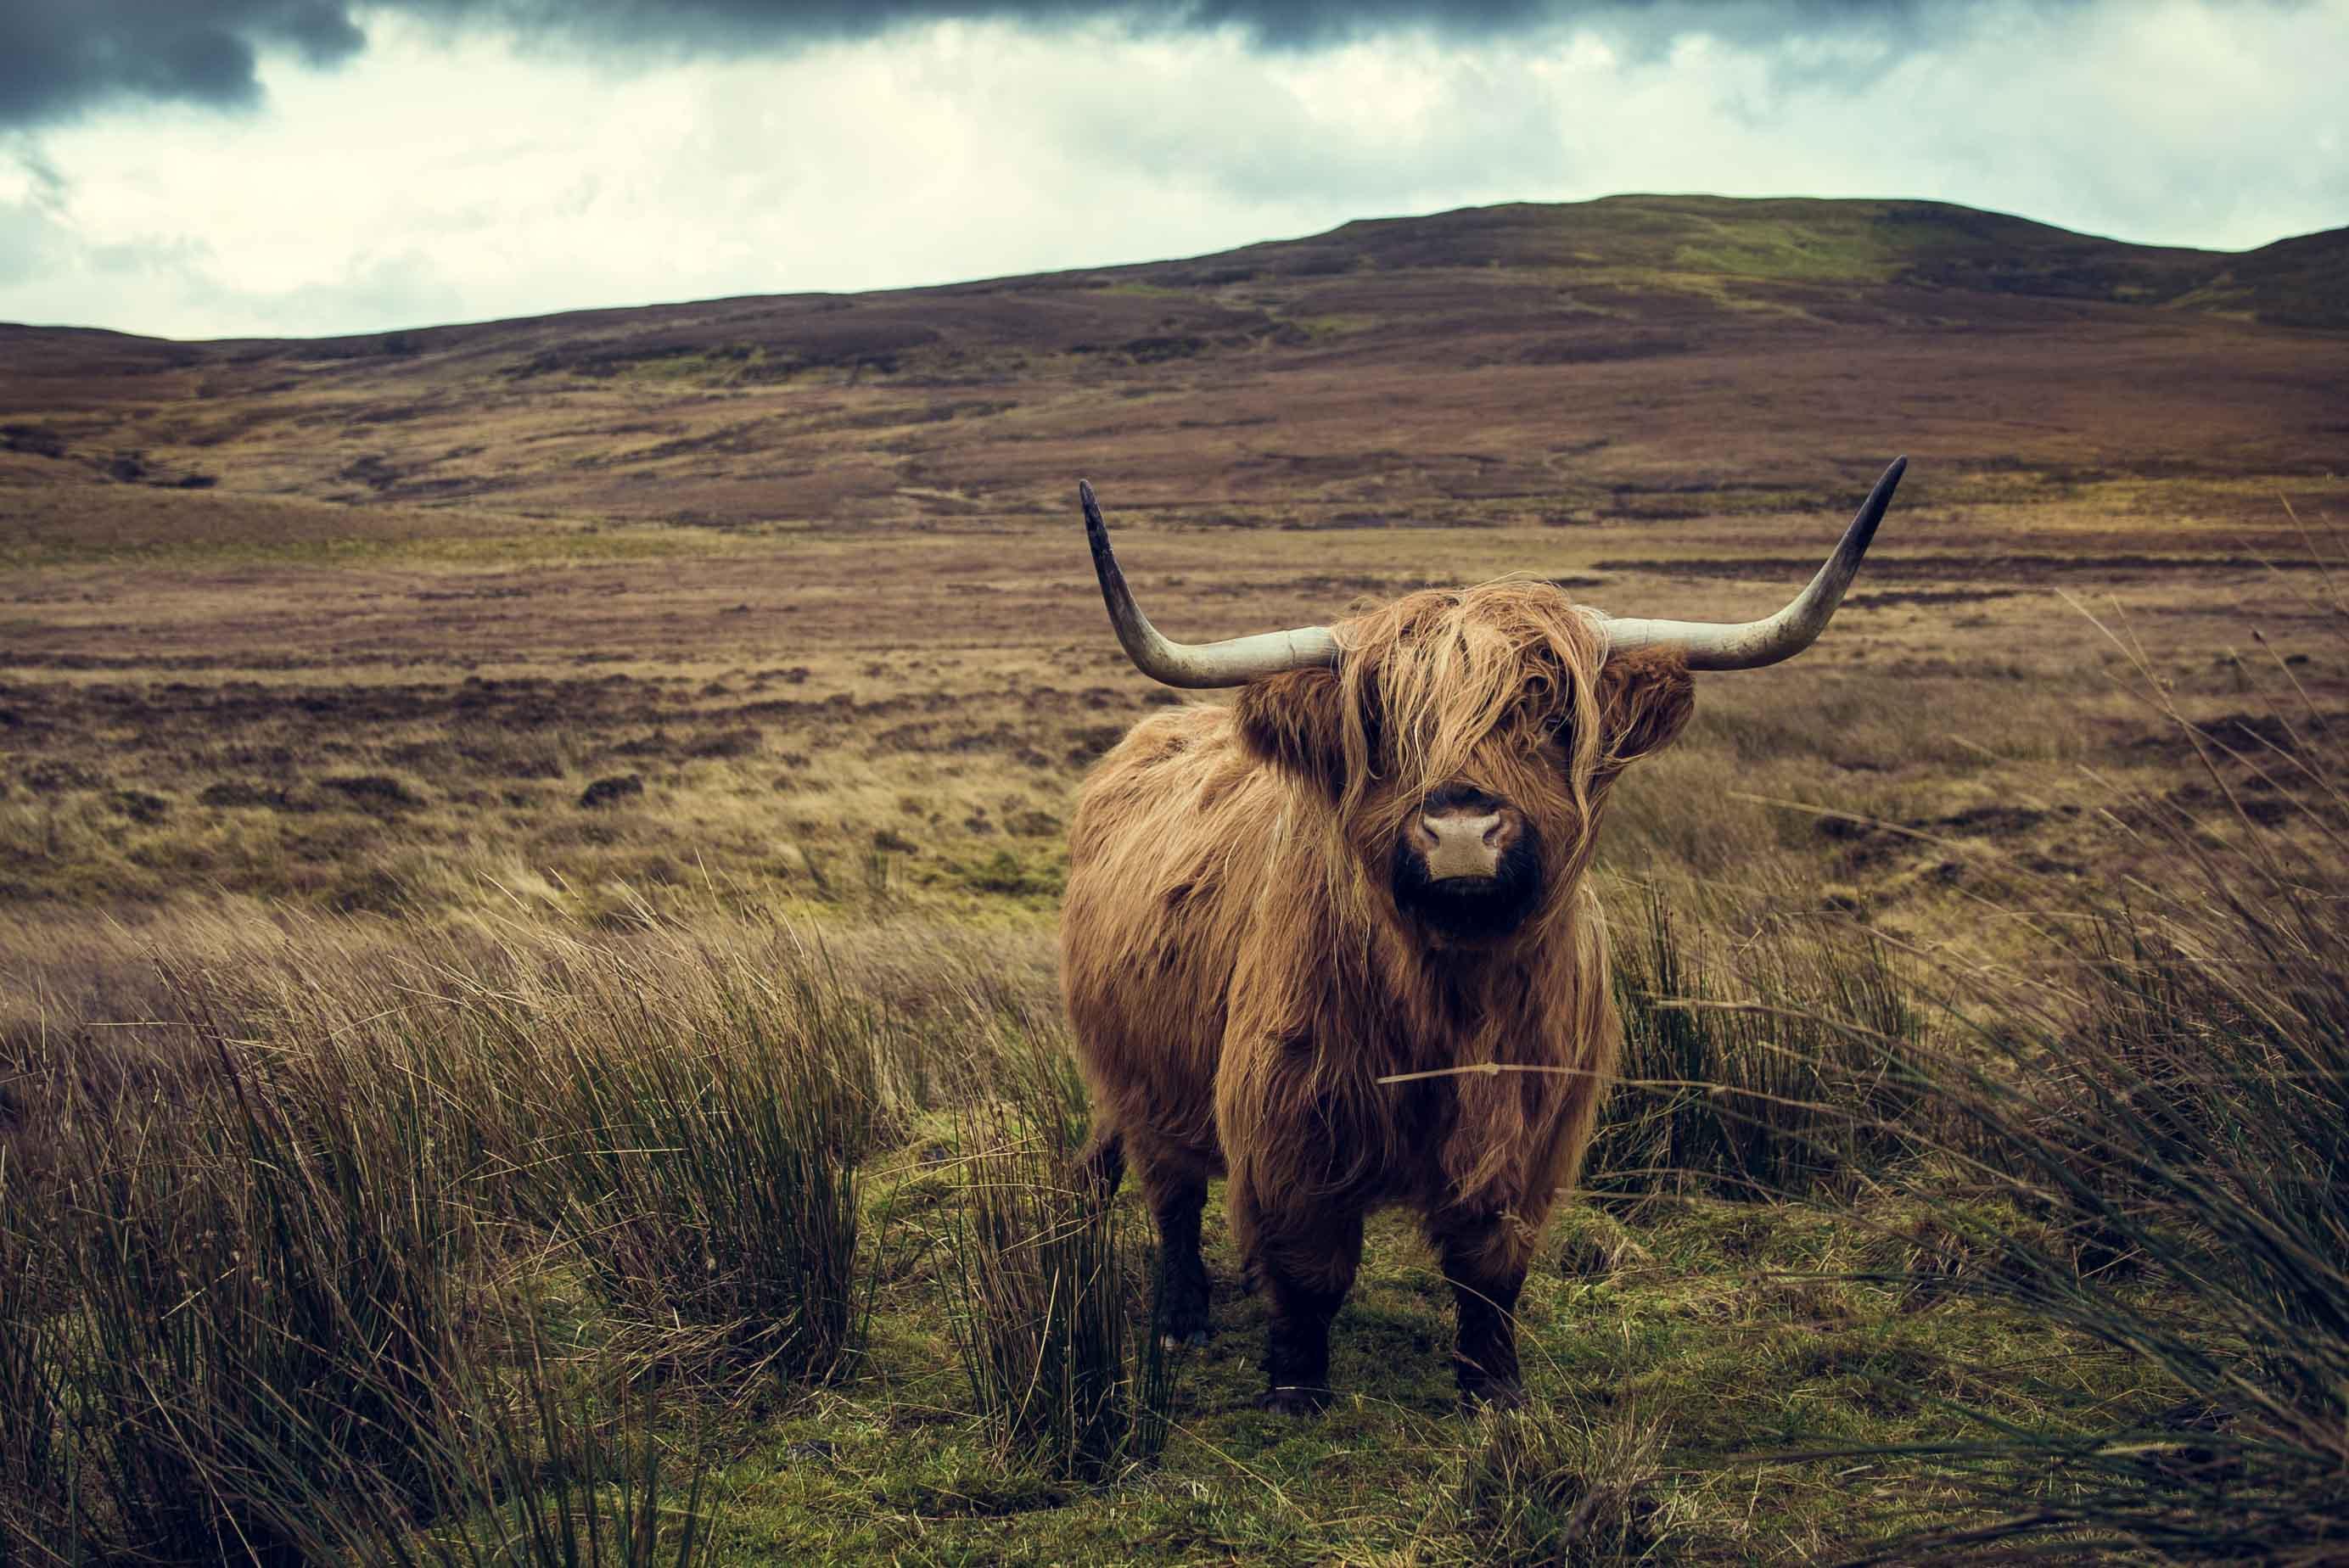 Écosse Ile de Skye montagne mer loch ness nessie taureau Scotland Inverness bull